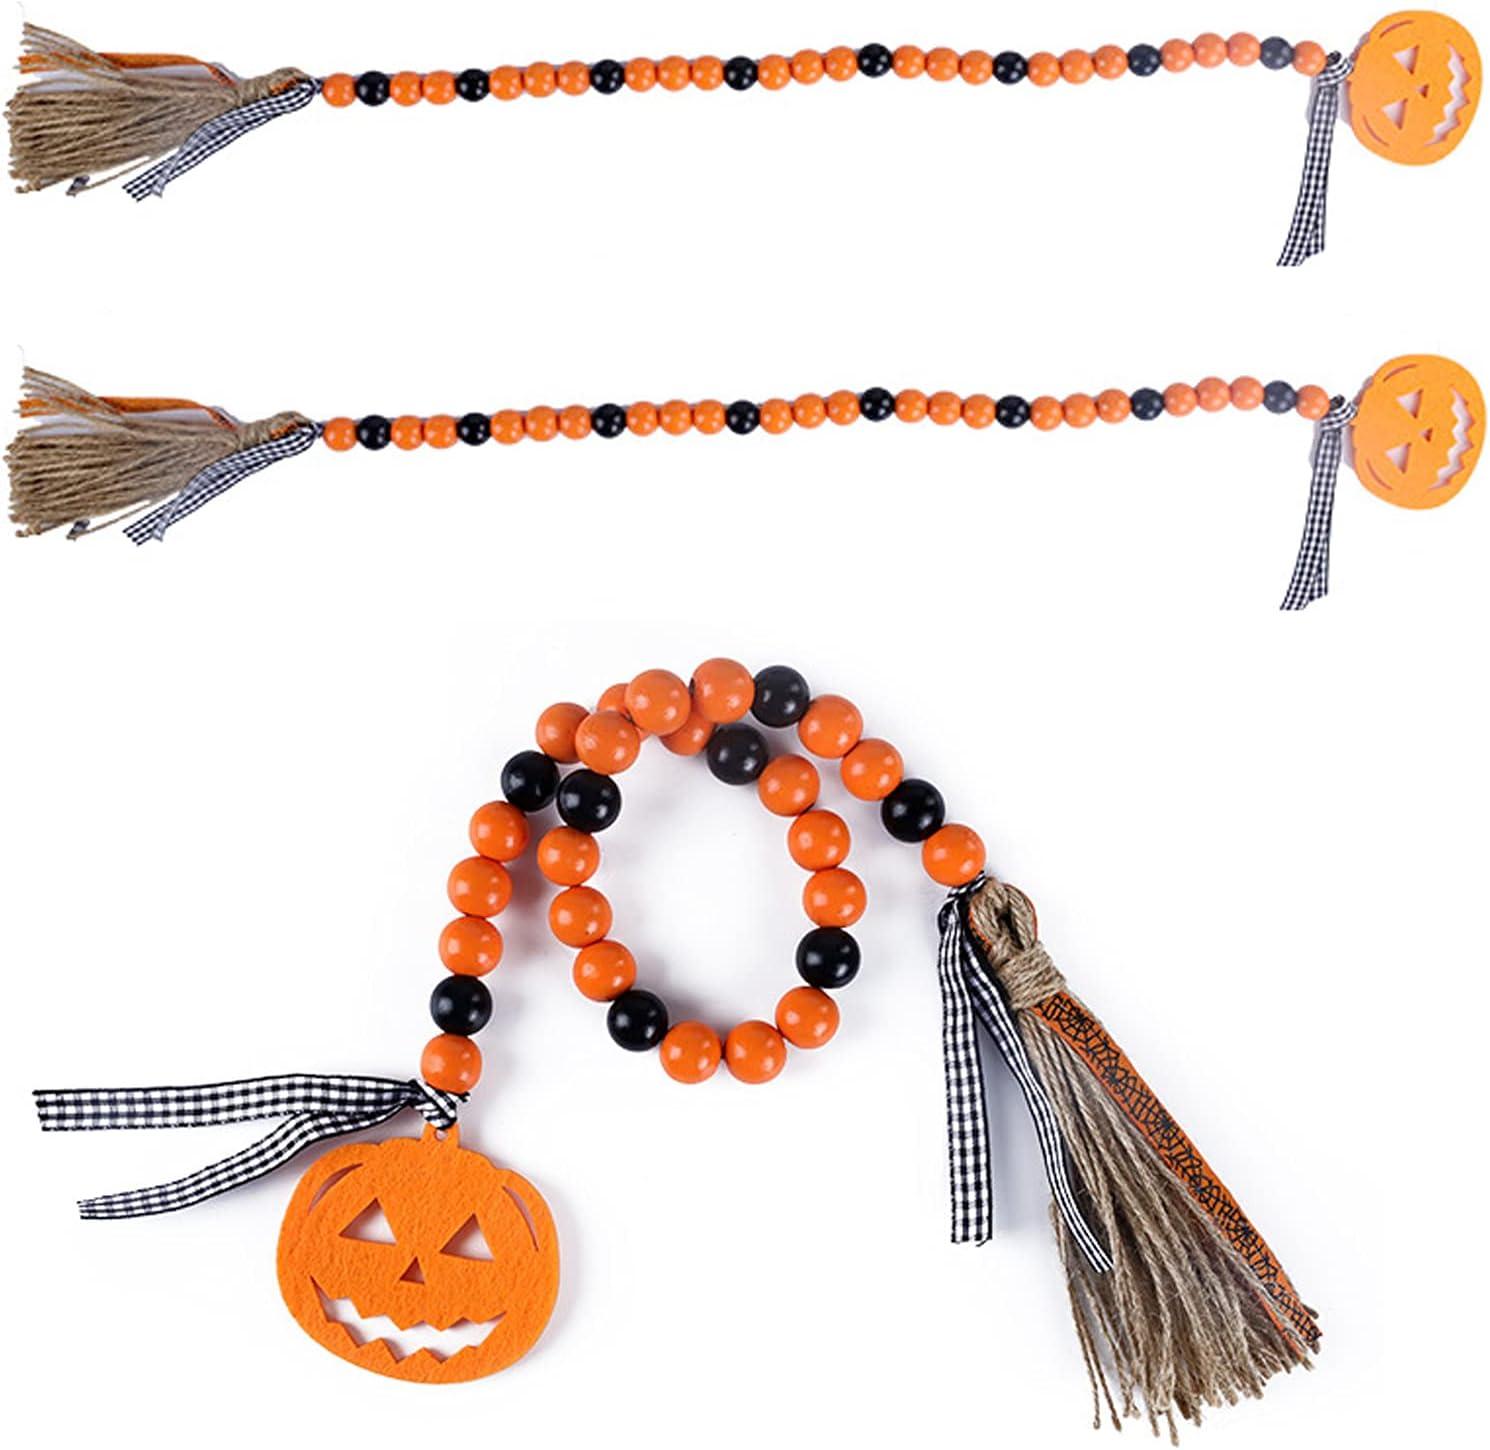 3 Pcs Halloween Wooden Seattle 2021 Mall Beads Garland with BlackOrange Tassels